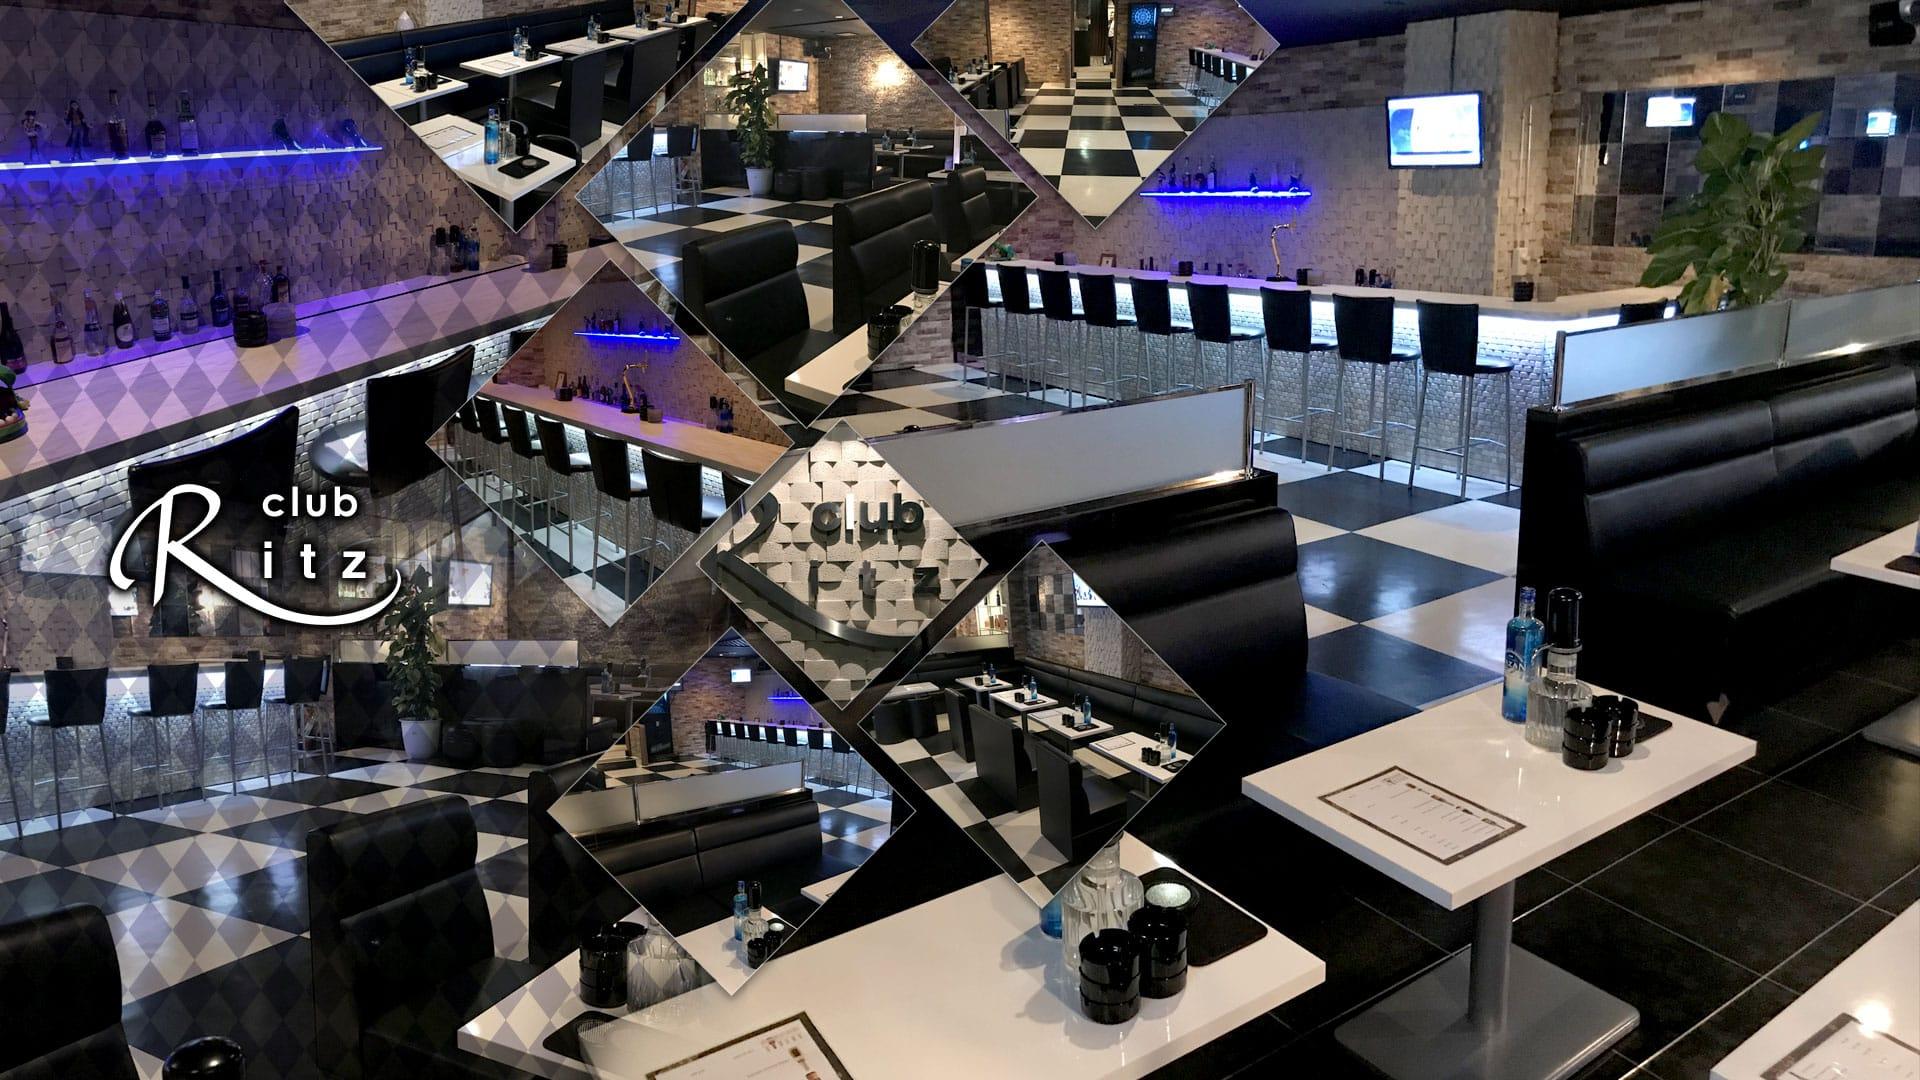 Club Ritz[リッツ] 坂戸 キャバクラ TOP画像